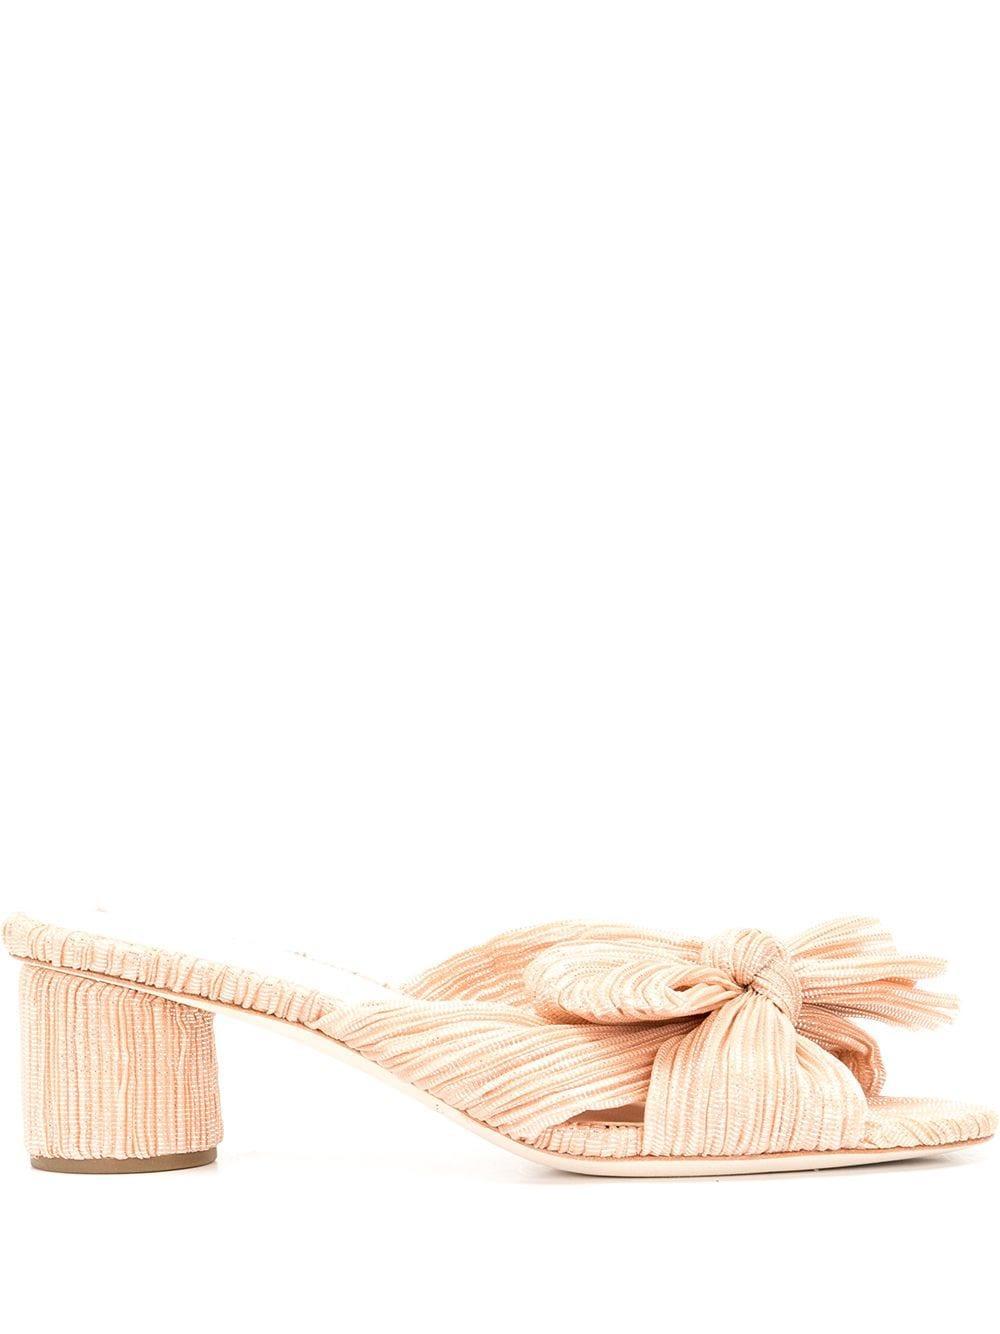 Pleated Knot Mule Item # EMILIA-PLA-S21